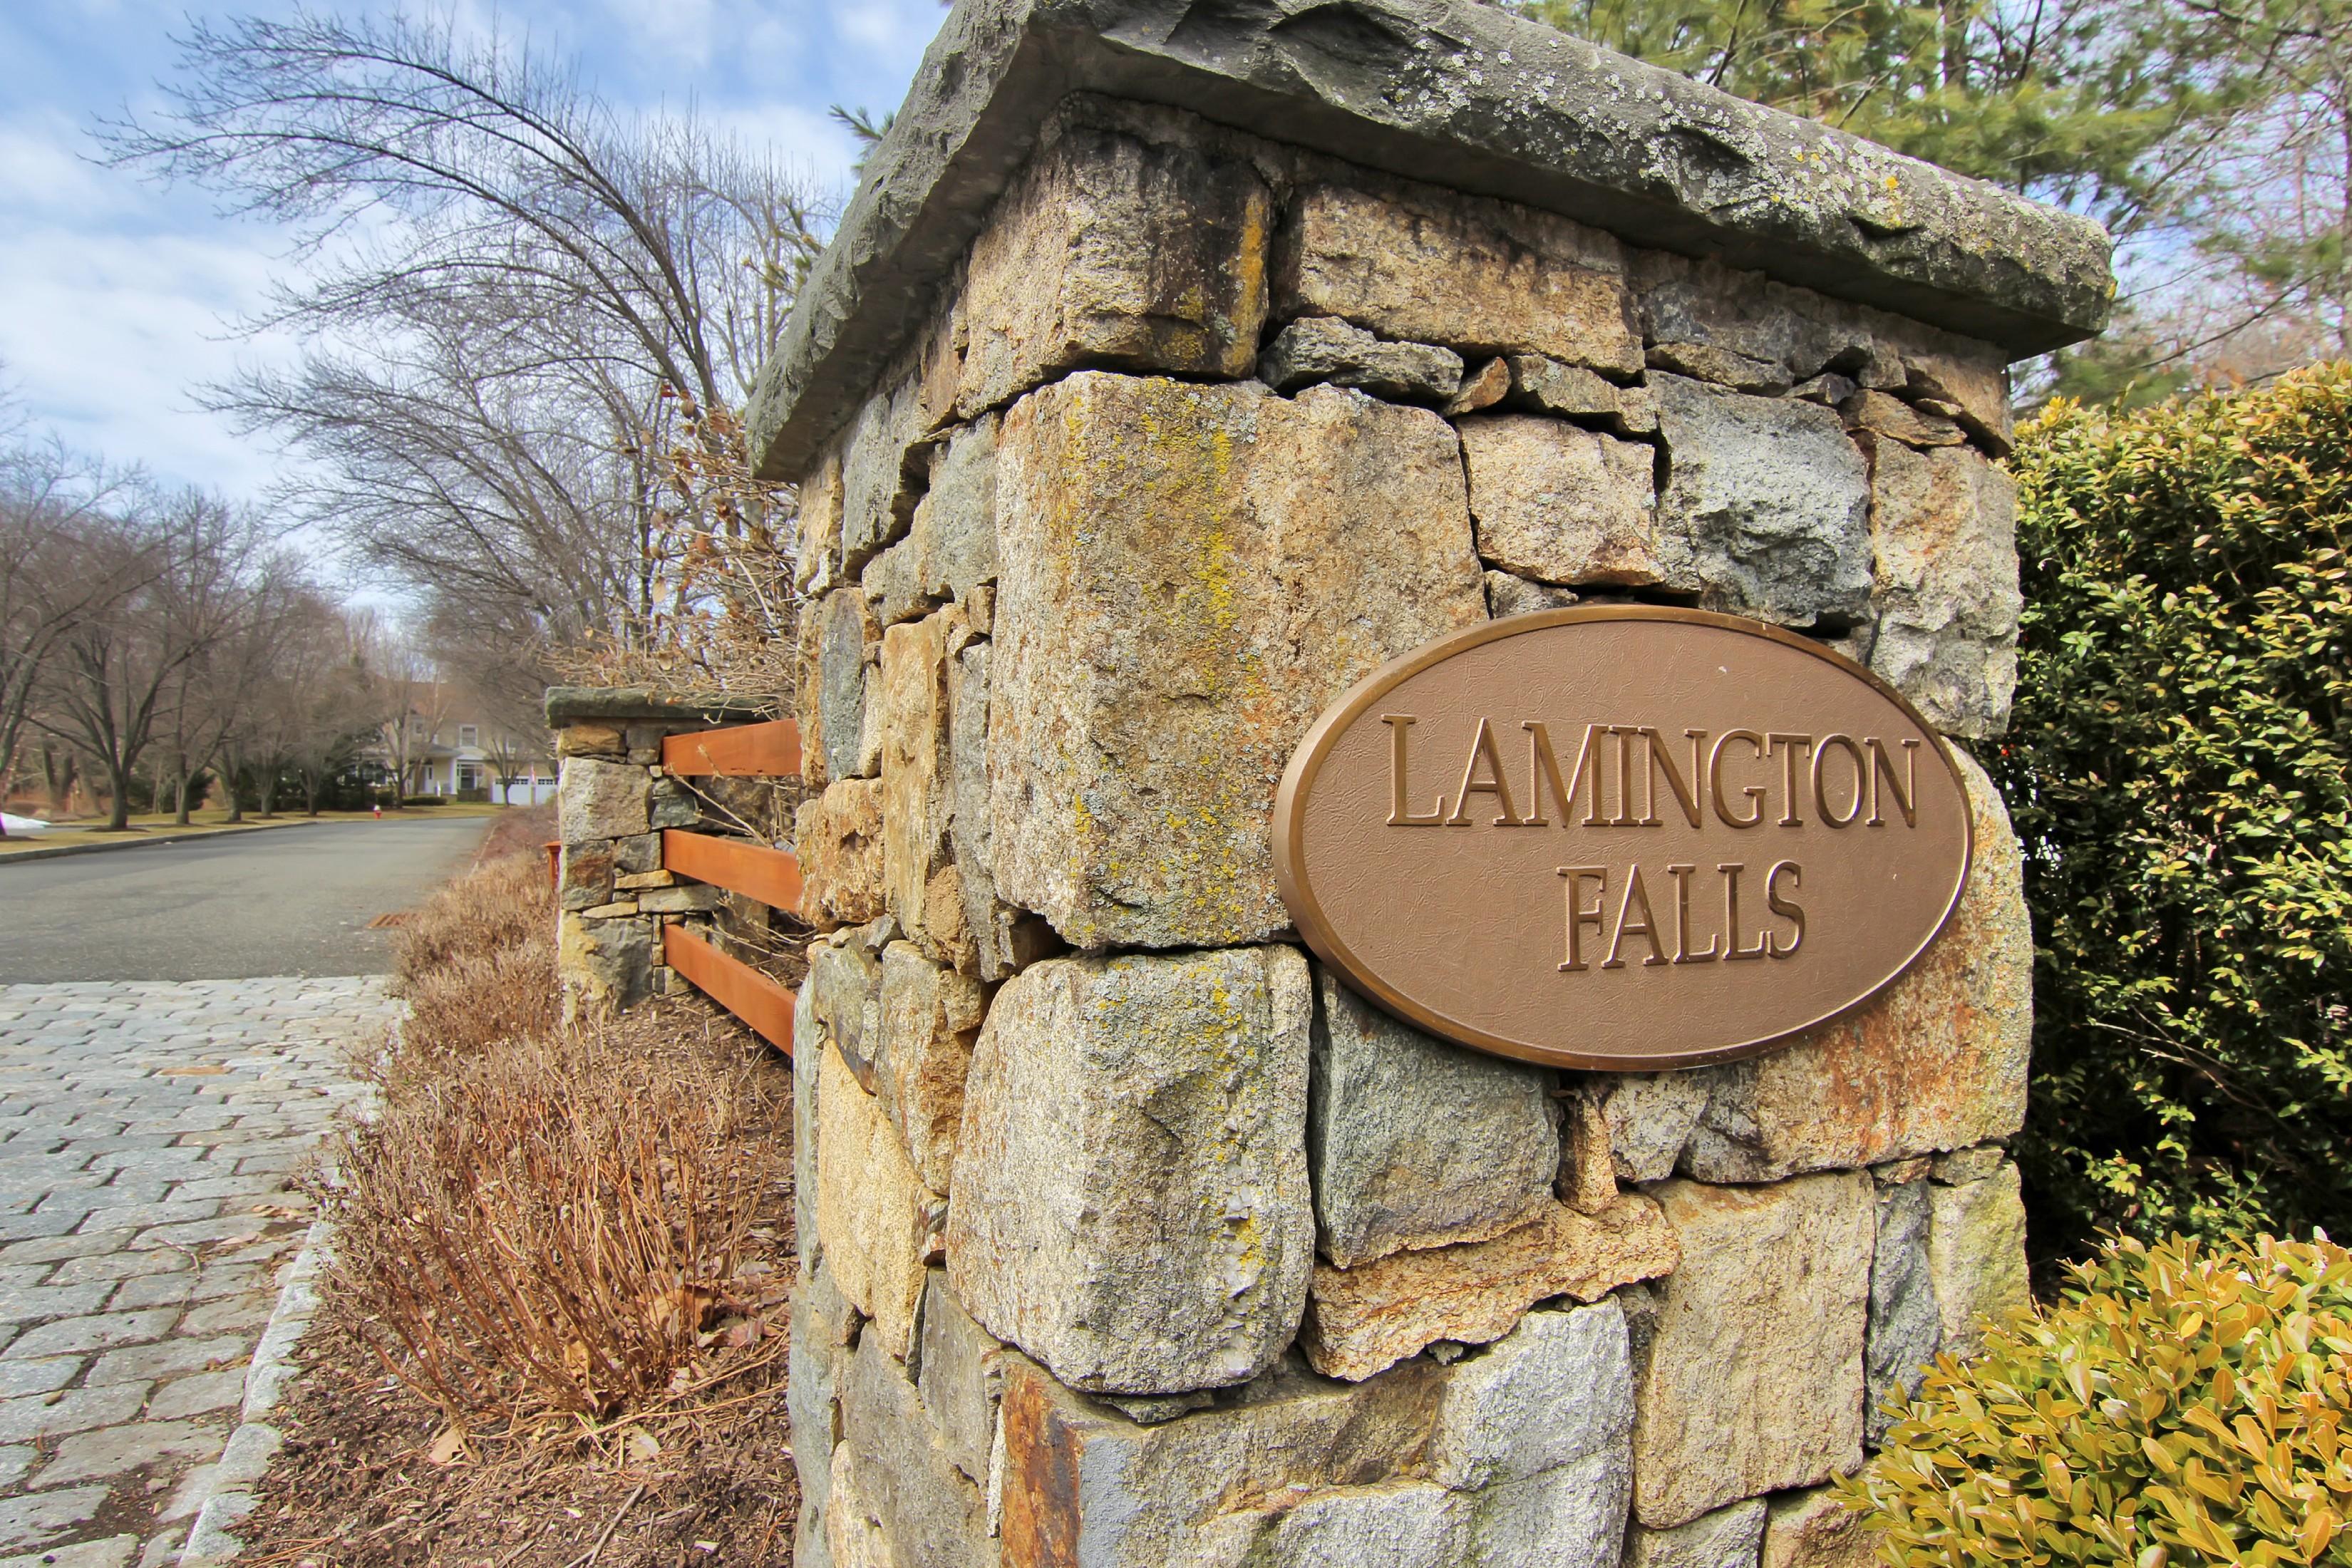 Villetta a schiera per Vendita alle ore Immaculate Lamington Falls Townhome 202 Lindabury Lane Tewksbury Township, New Jersey, 07830 Stati Uniti